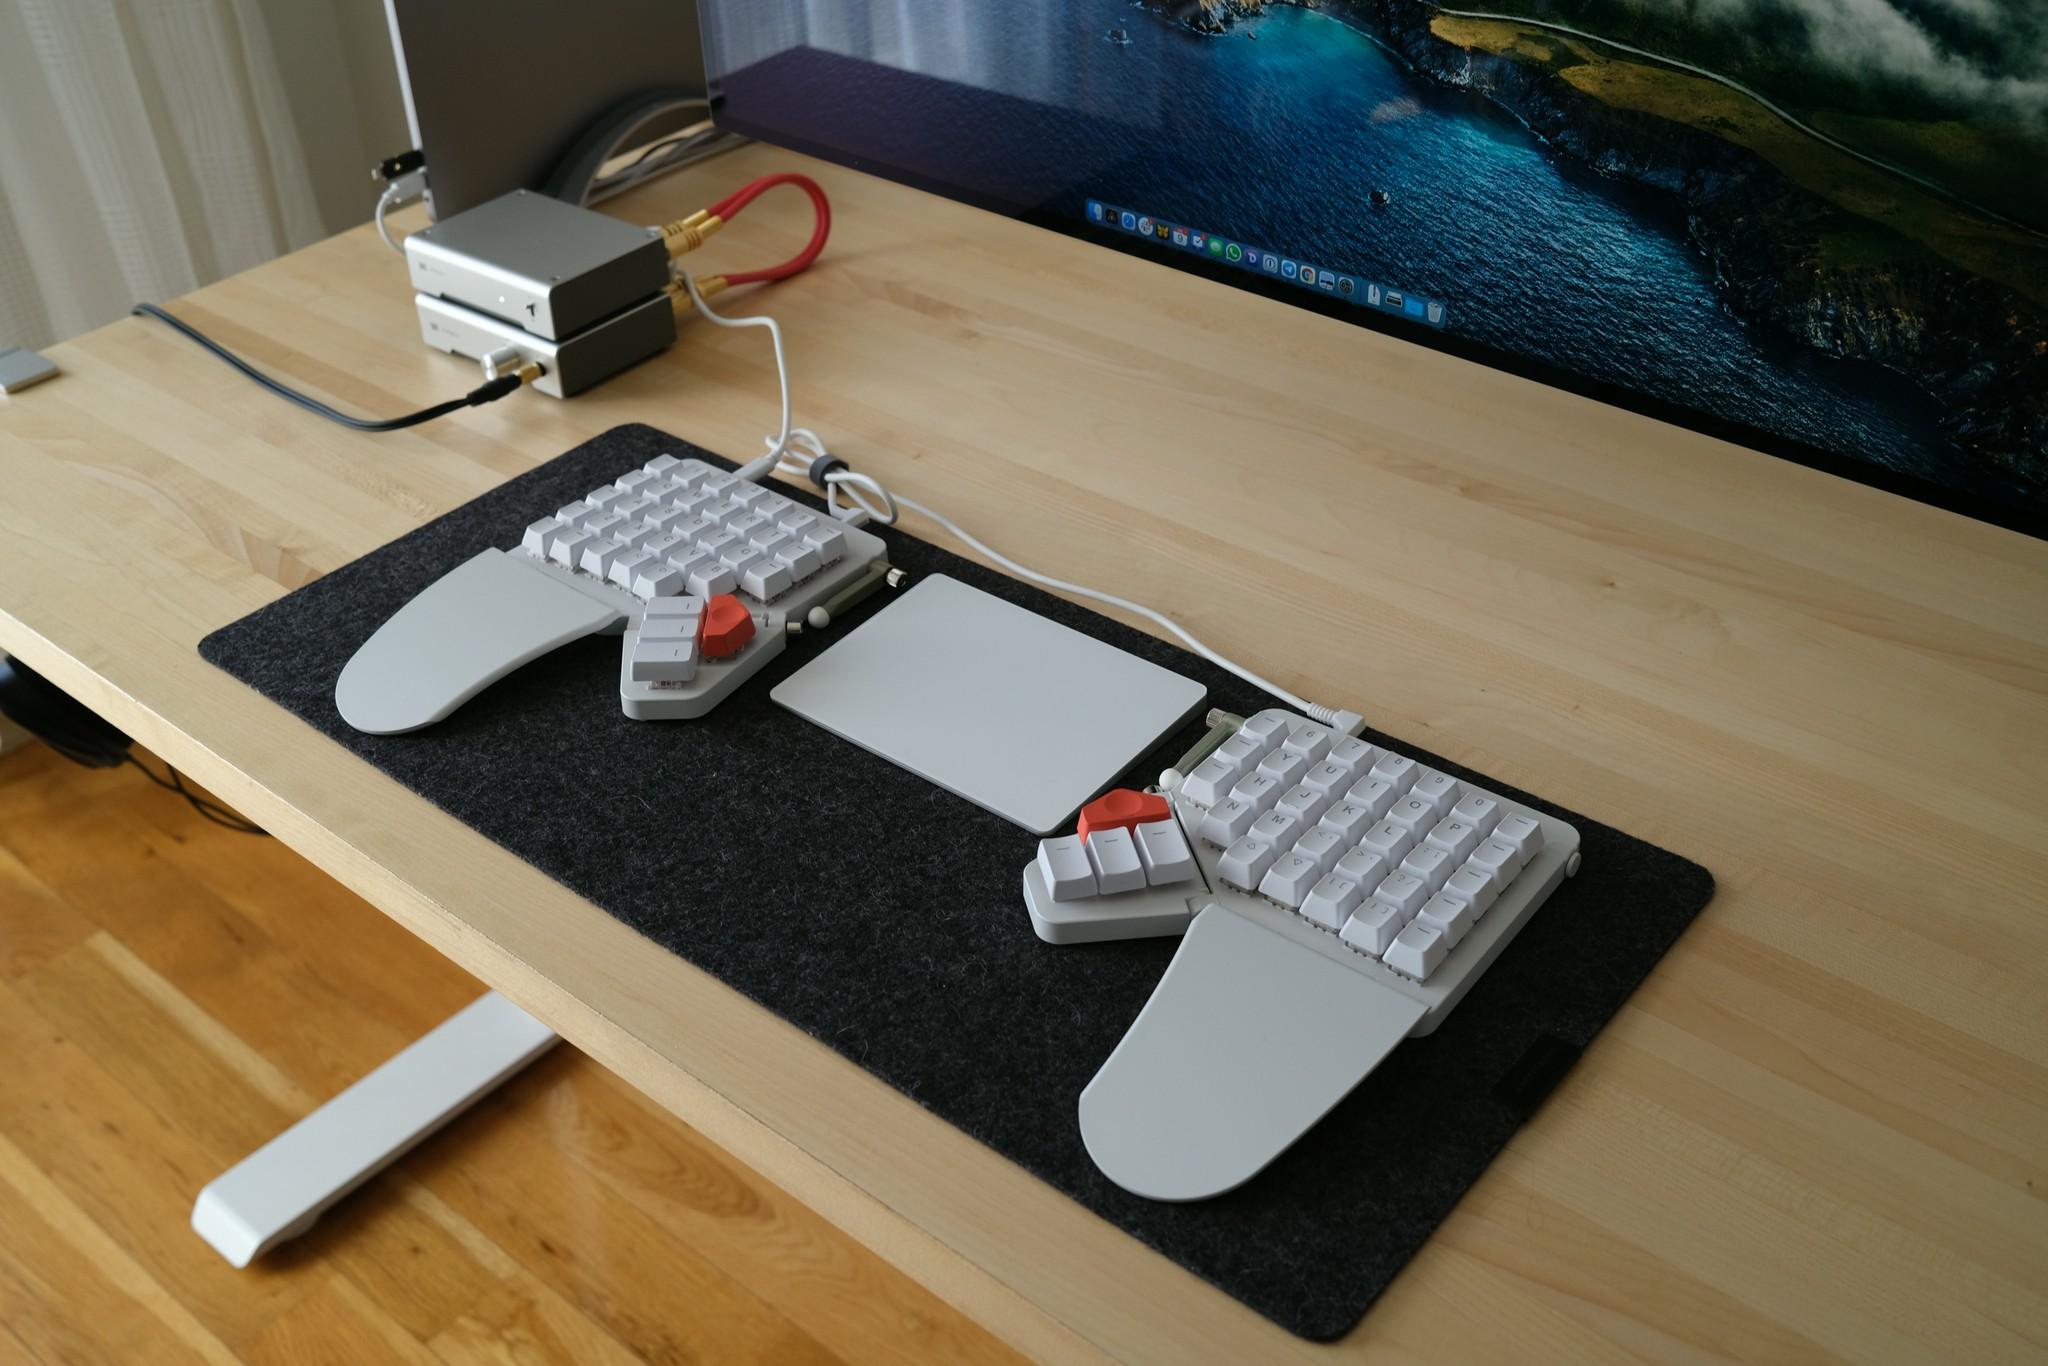 My review of the Moonlander MK1 keyboard